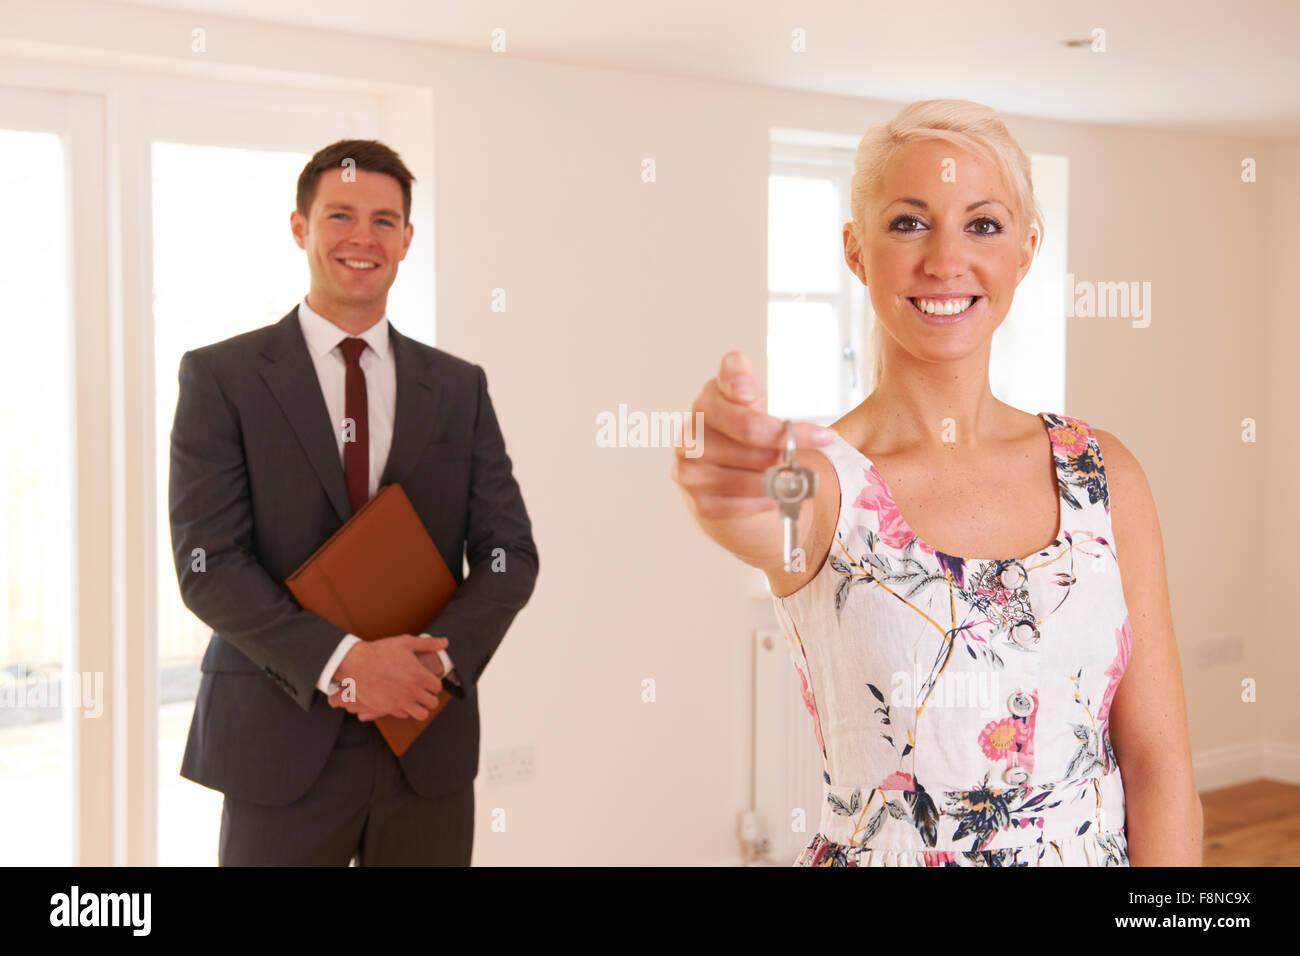 Estate Agent Handing Over Keys To Female House Buyer - Stock Image